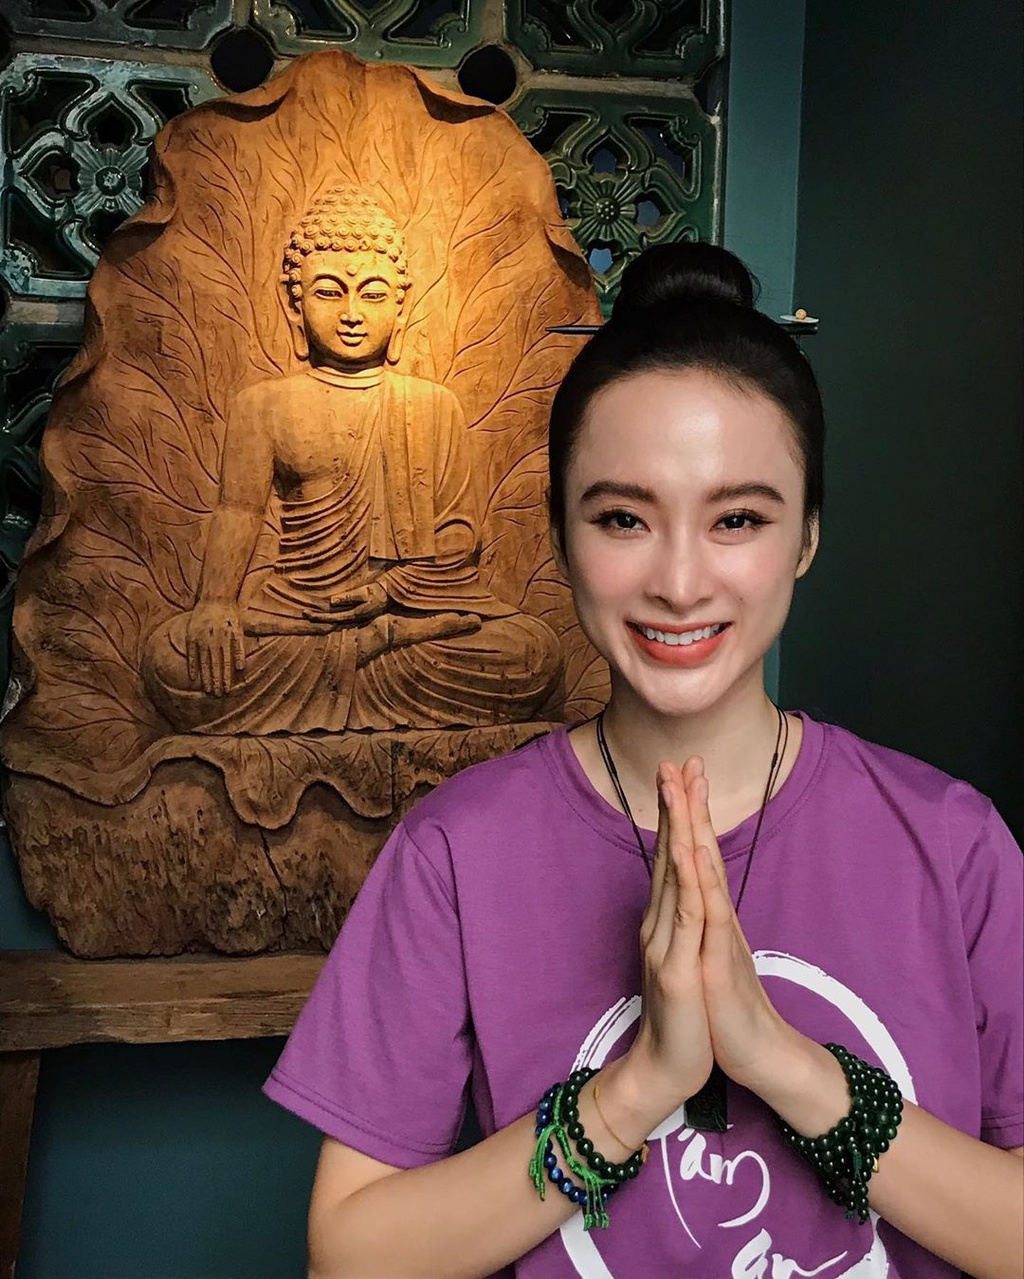 Sao nhi mot thoi - Xuan Mai sinh 3 con, Phuong Trinh tam roi showbiz hinh anh 8 angela.phuongtrinh_87574404_2224872301153277_8683971239573710167_n.jpg